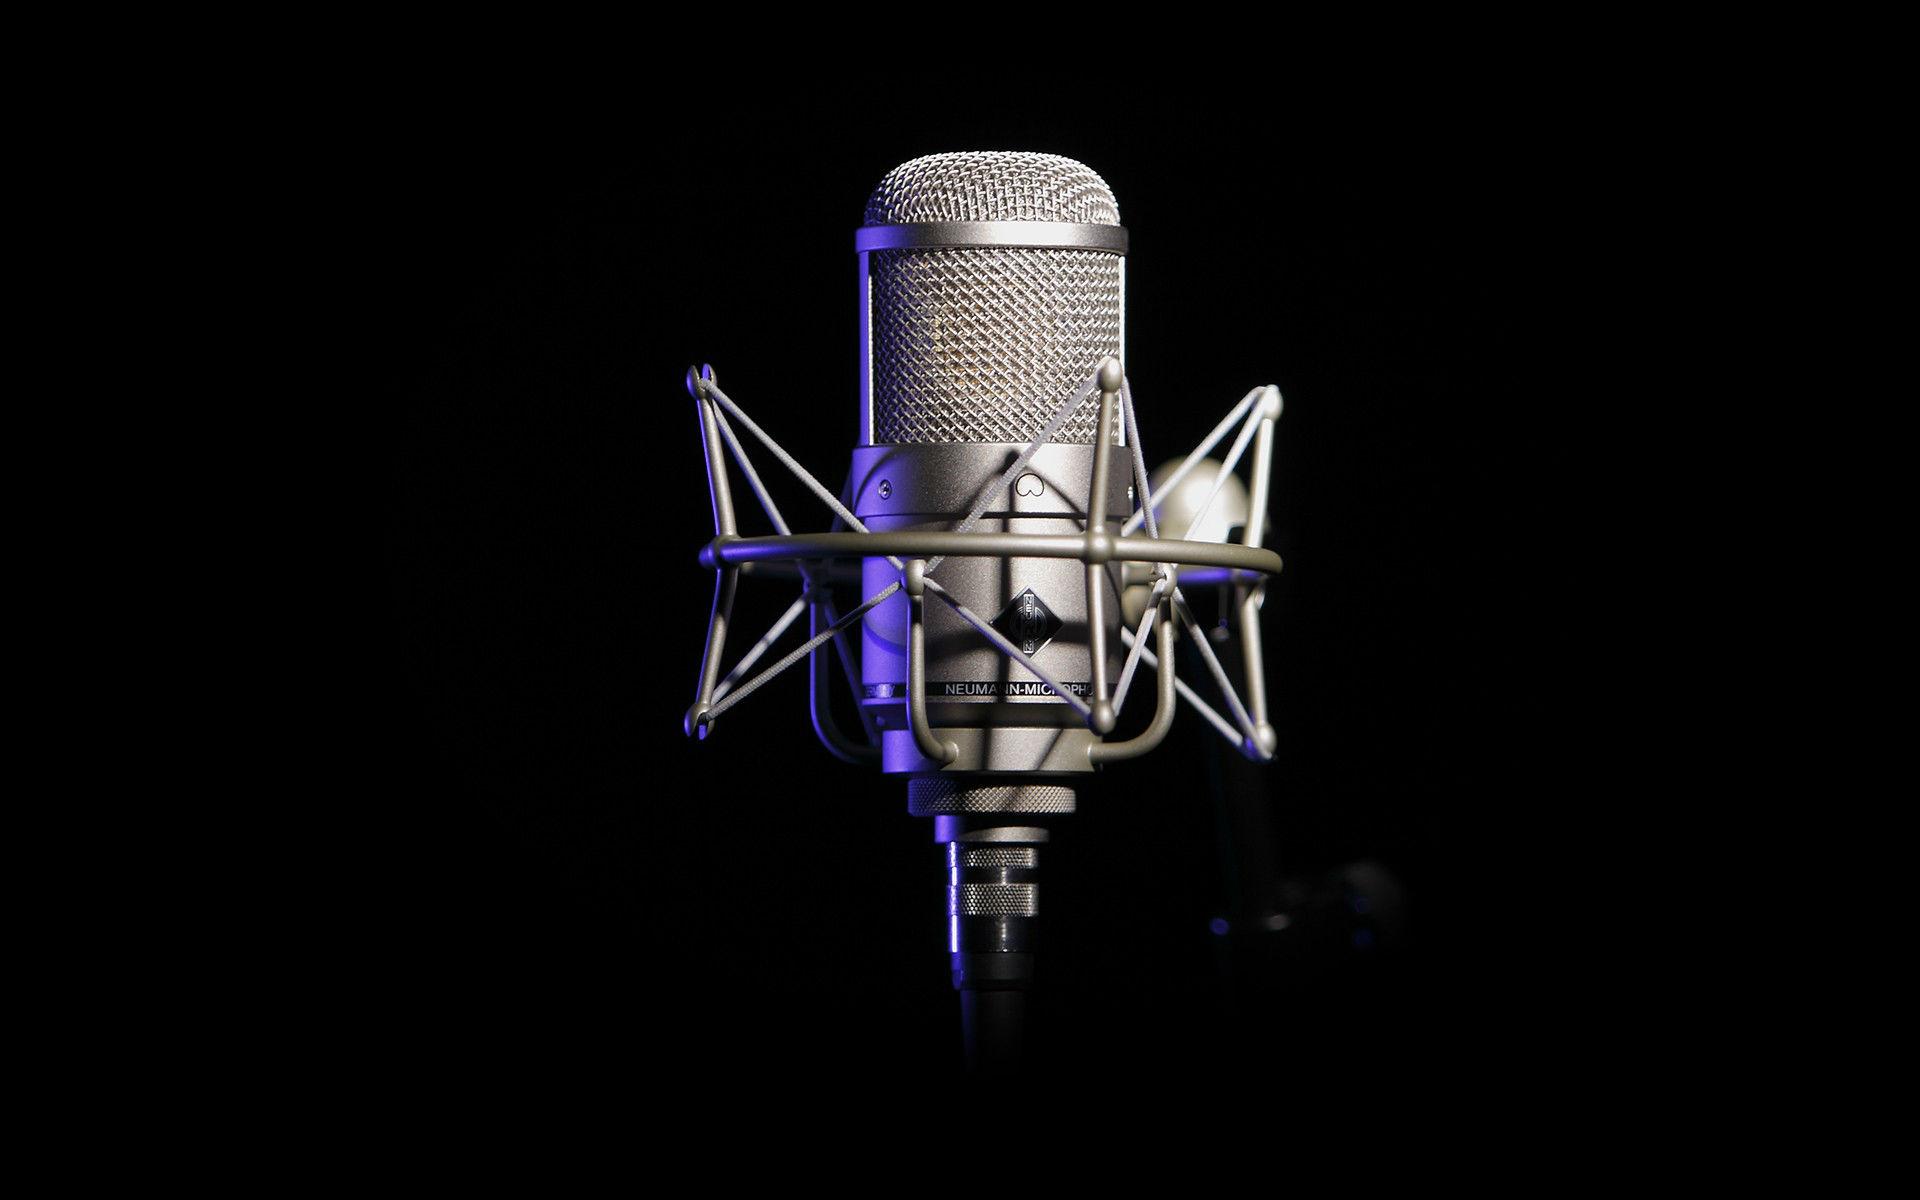 Hd Wallpapers 1080p Music: Music Recording Studio HD Wallpaper